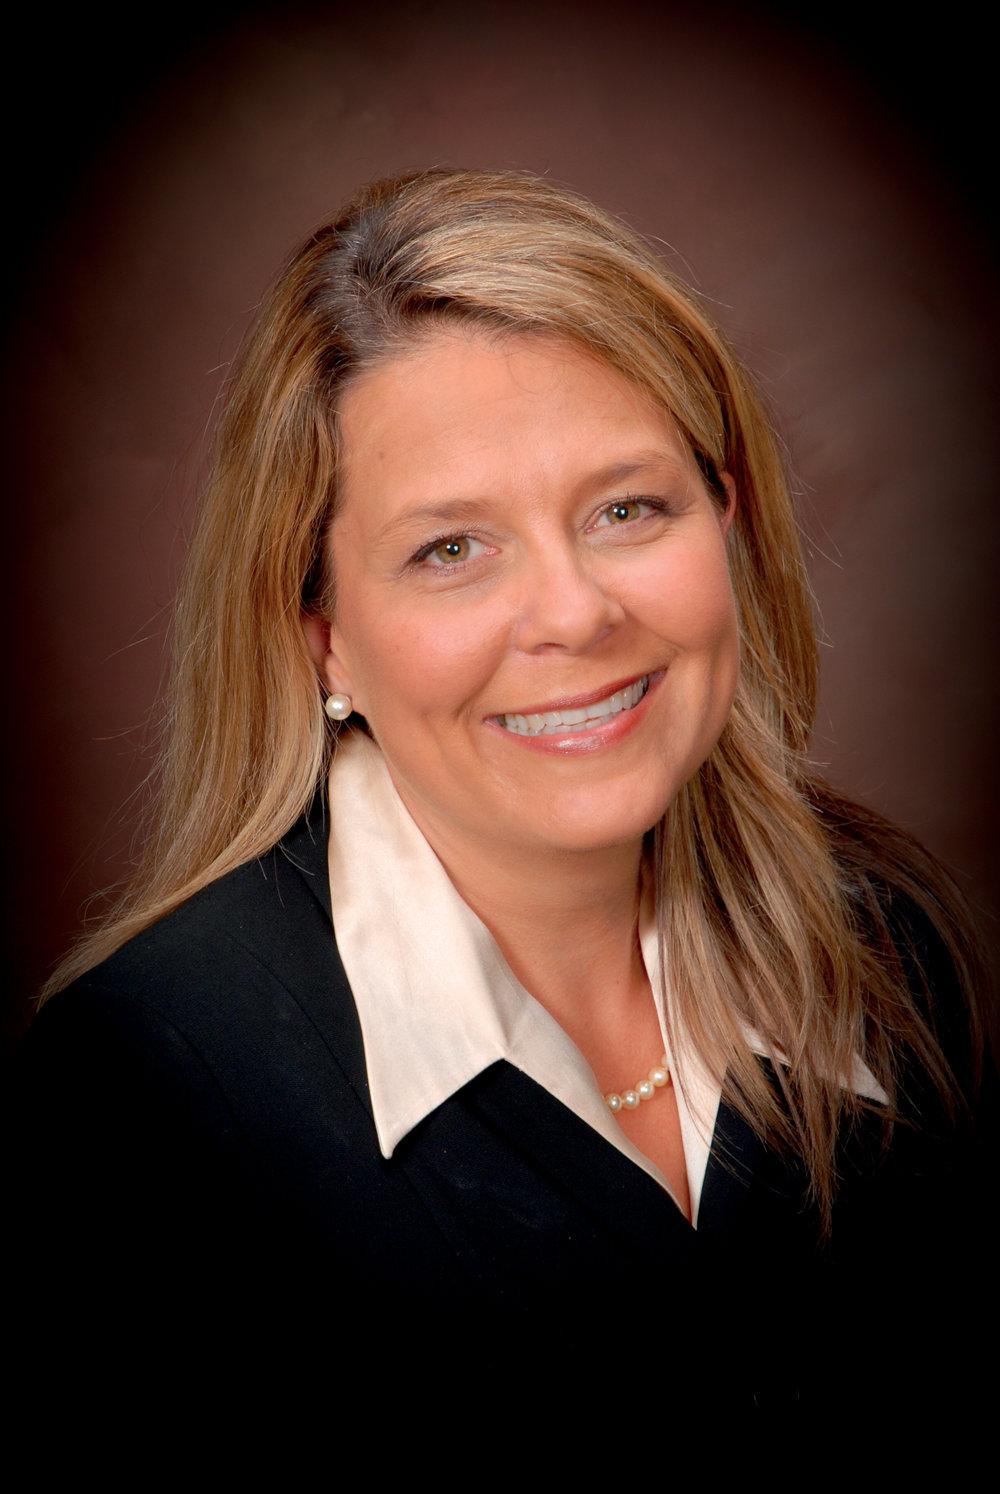 DeeAnna Esslinger, Executive Director